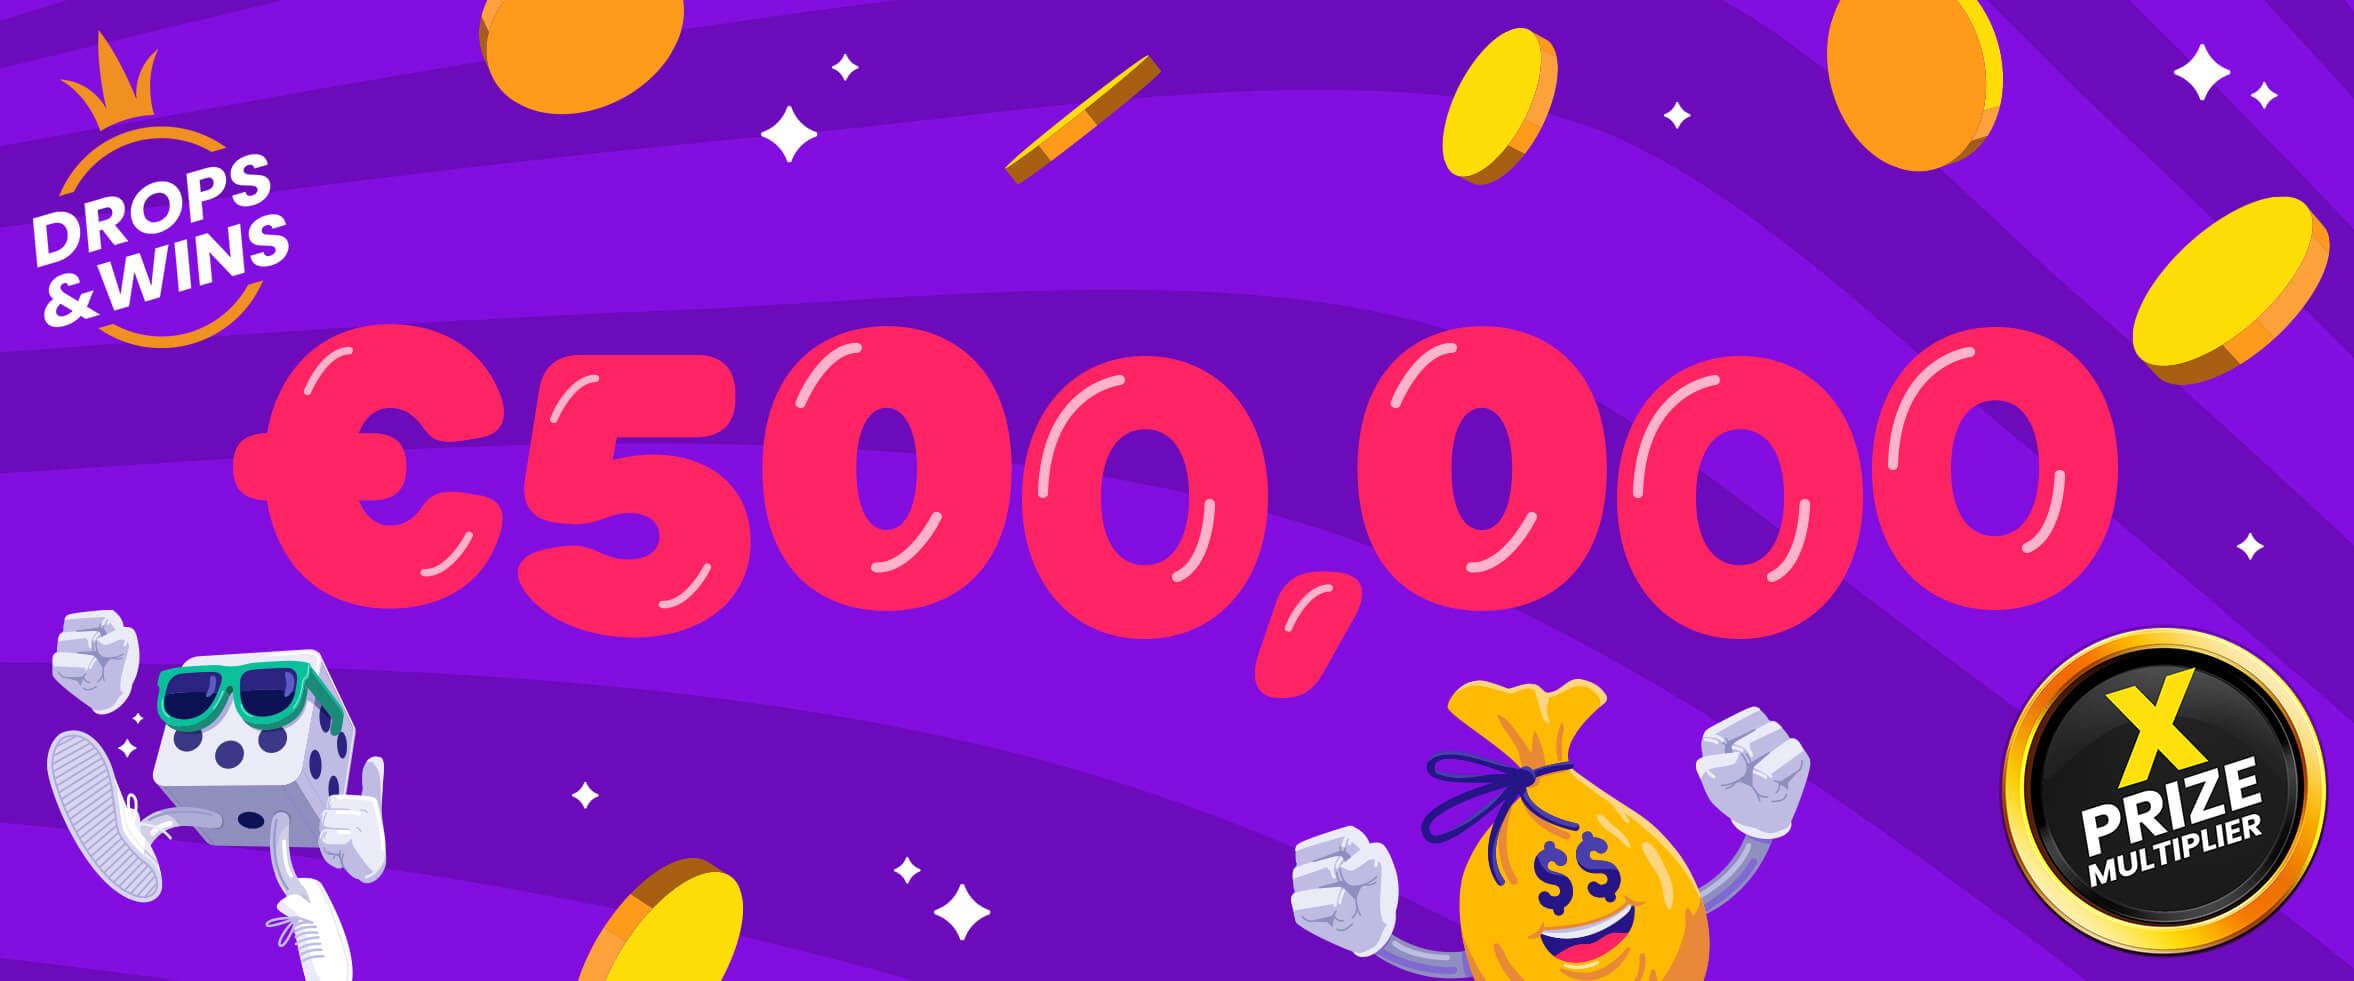 Pragmatic Play dobler månedlige Drops & Wins-premier til 5 millioner kr